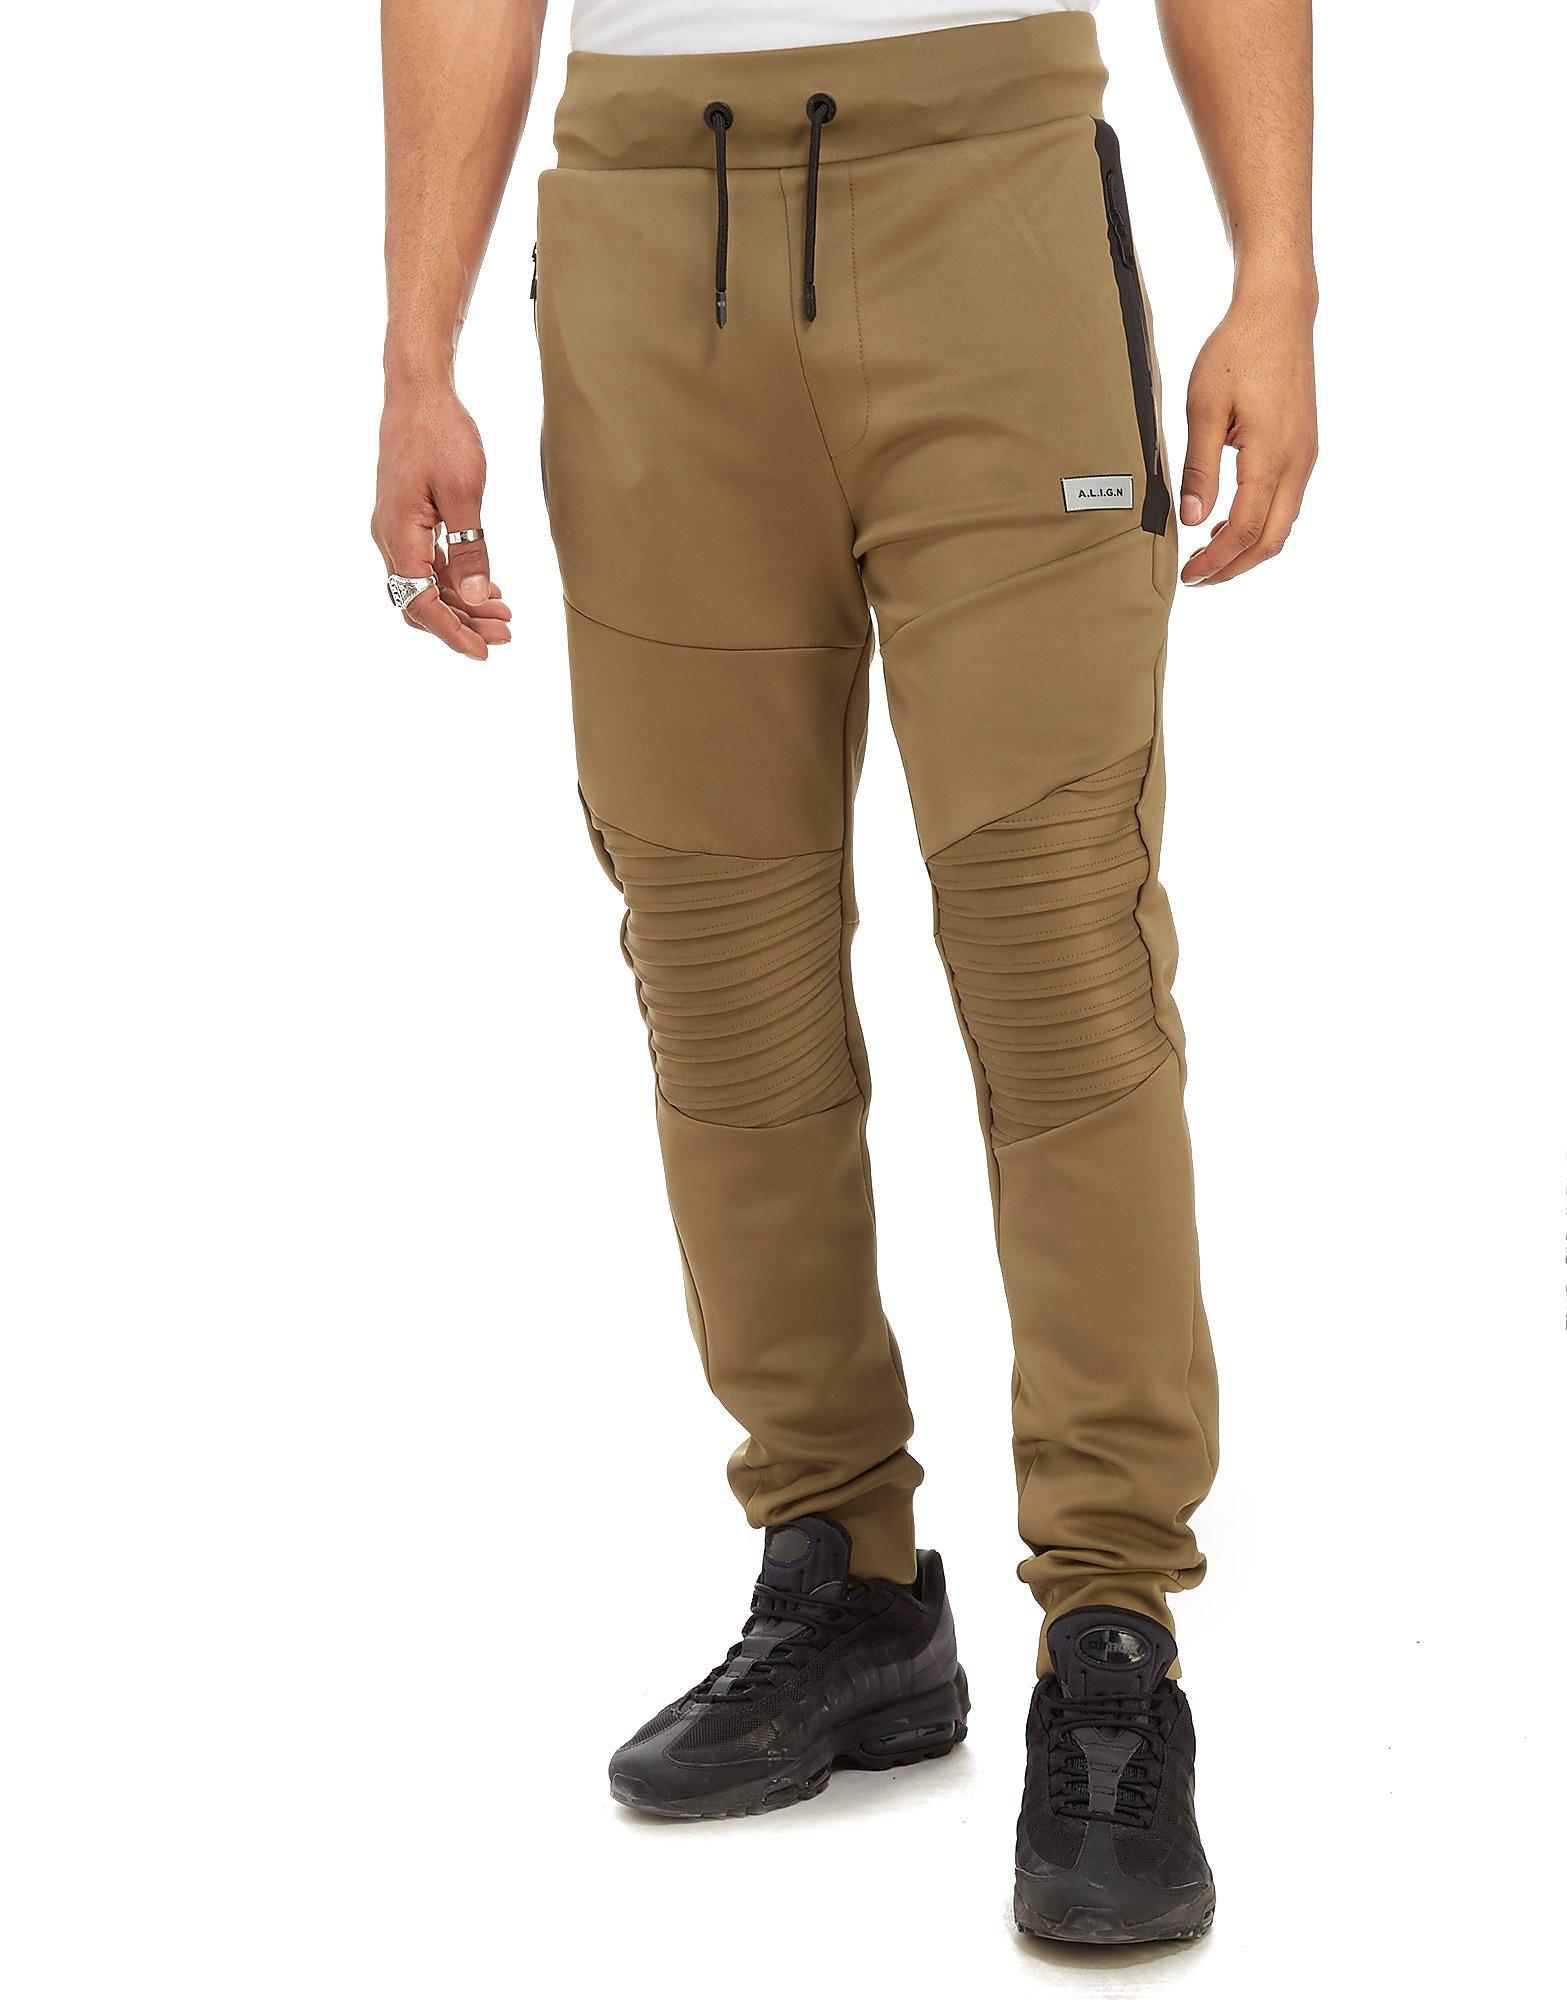 Align Mustang Pants Heren - Khaki/Khaki - Heren